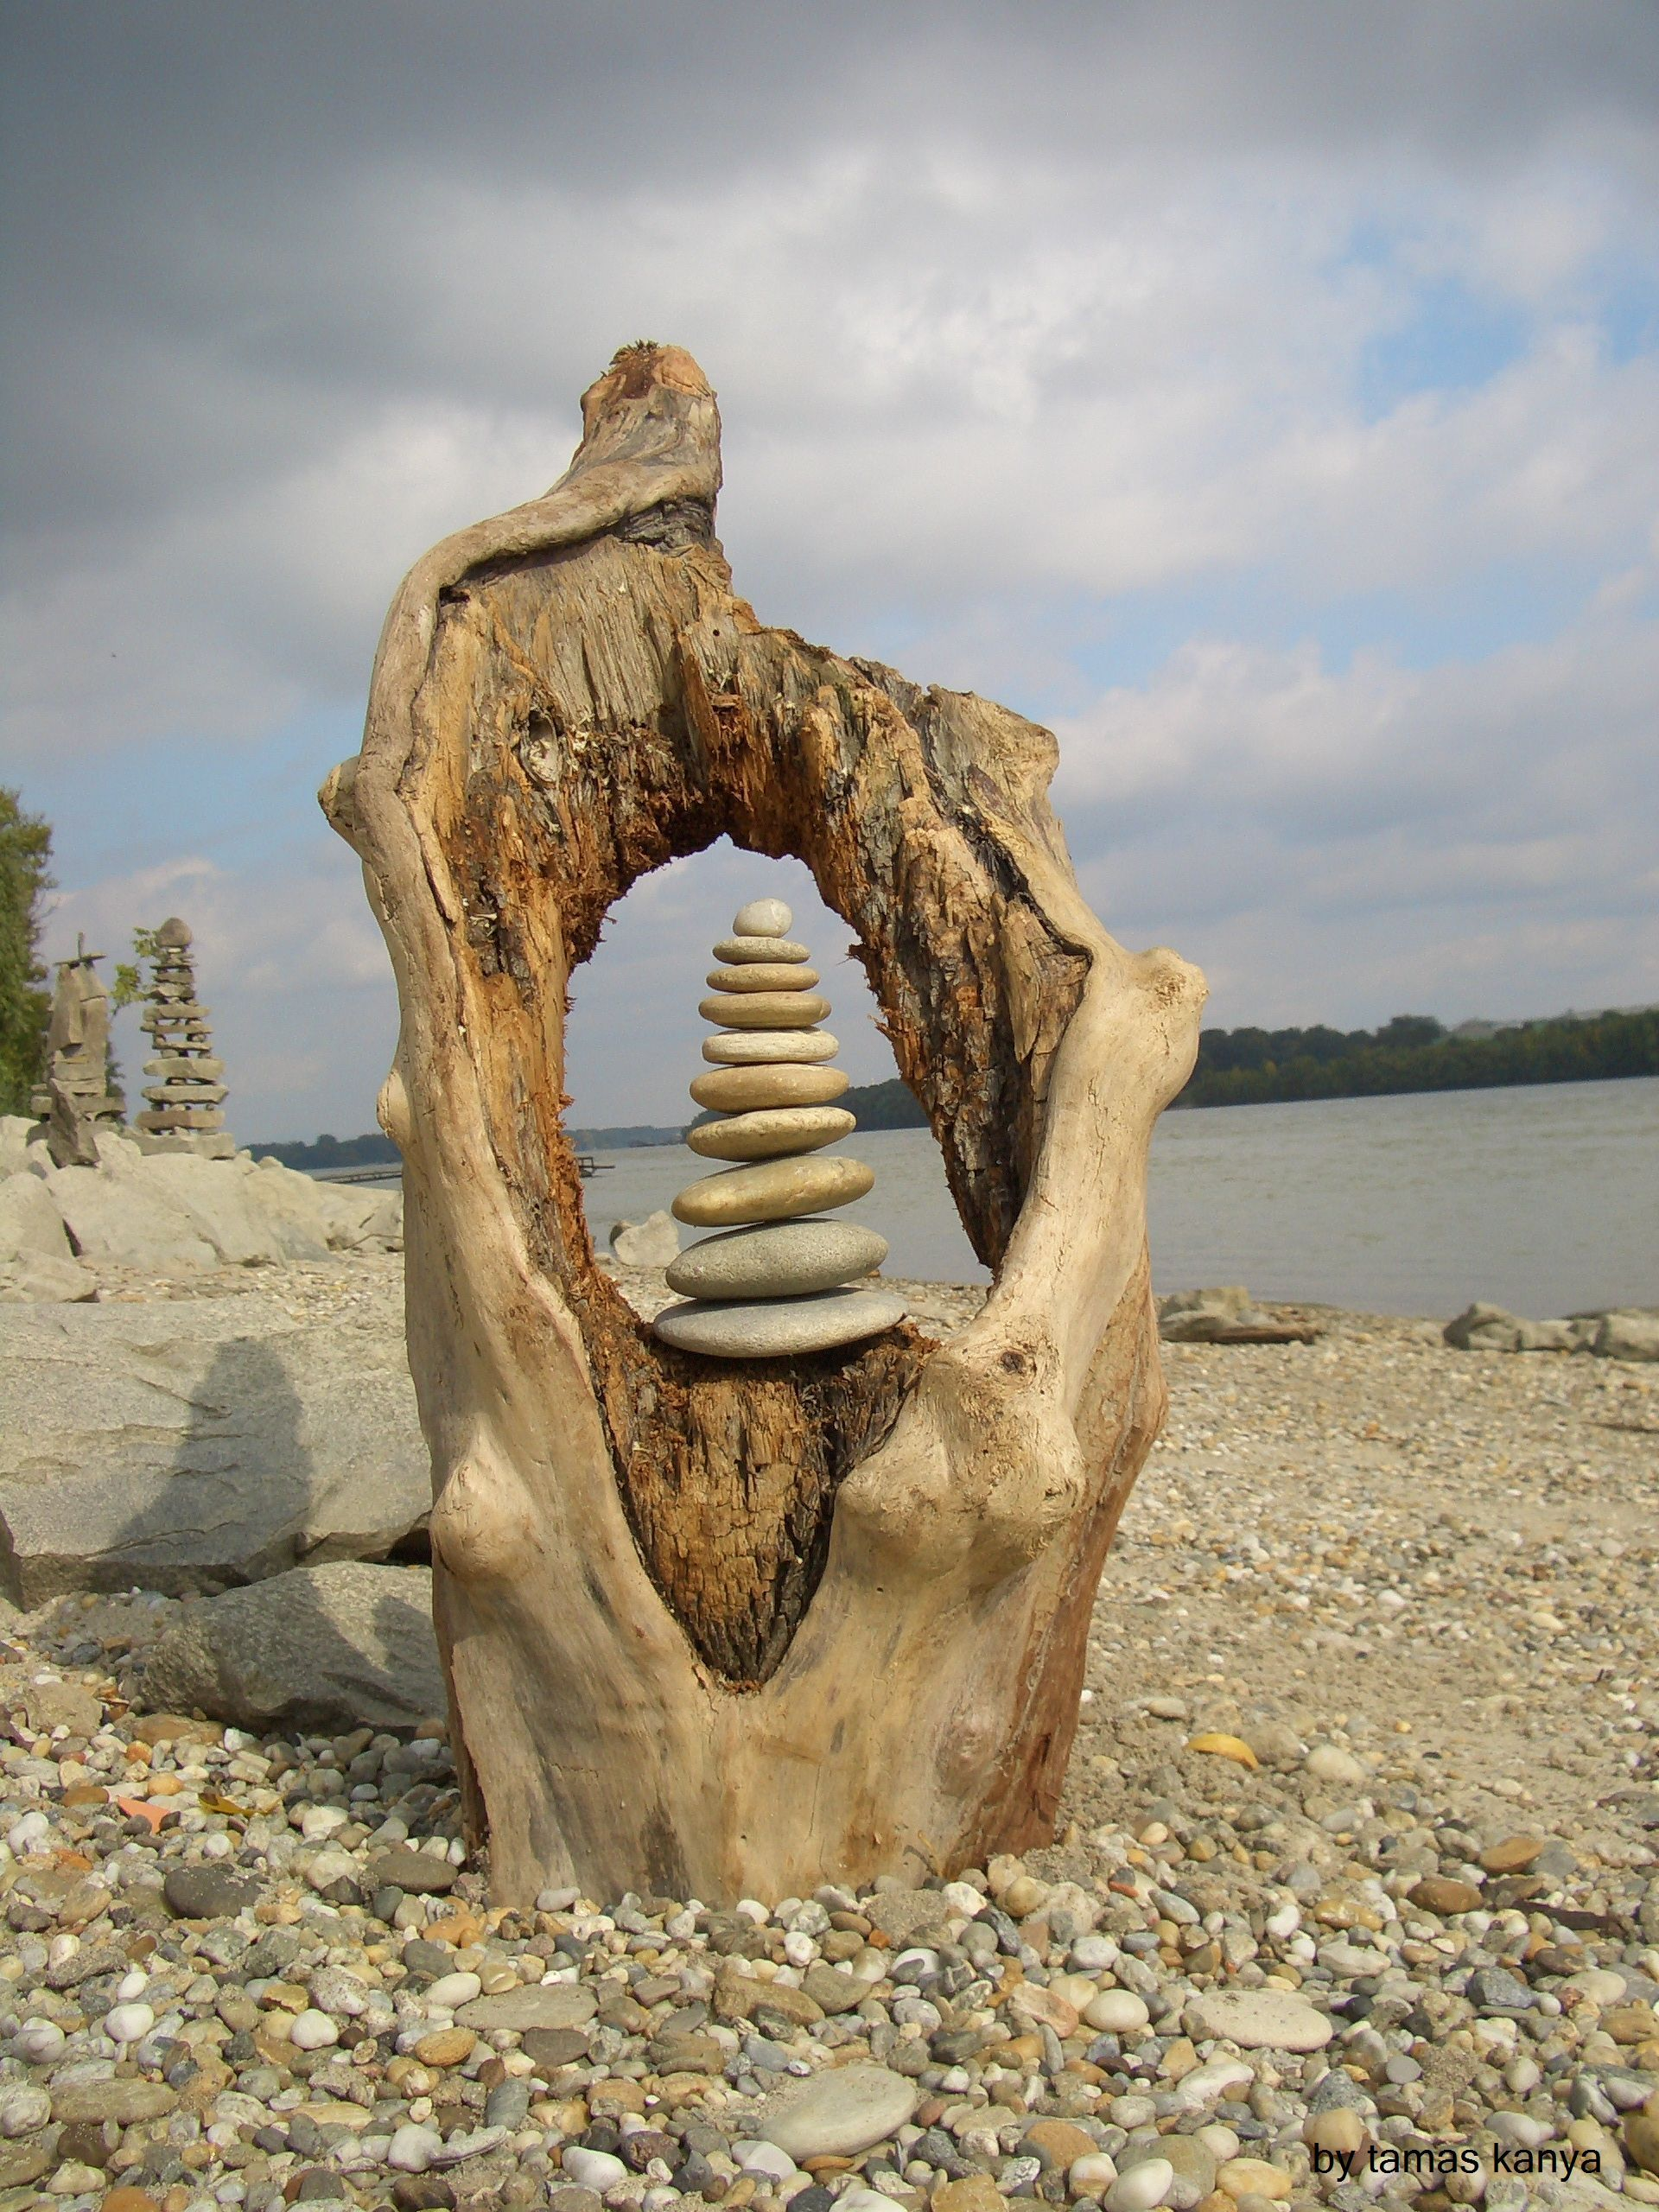 driftwood_art_stone_balance_by_tamas_kanya_by_tom_tom1969-d6oo9zq.jpg (1920×2560)